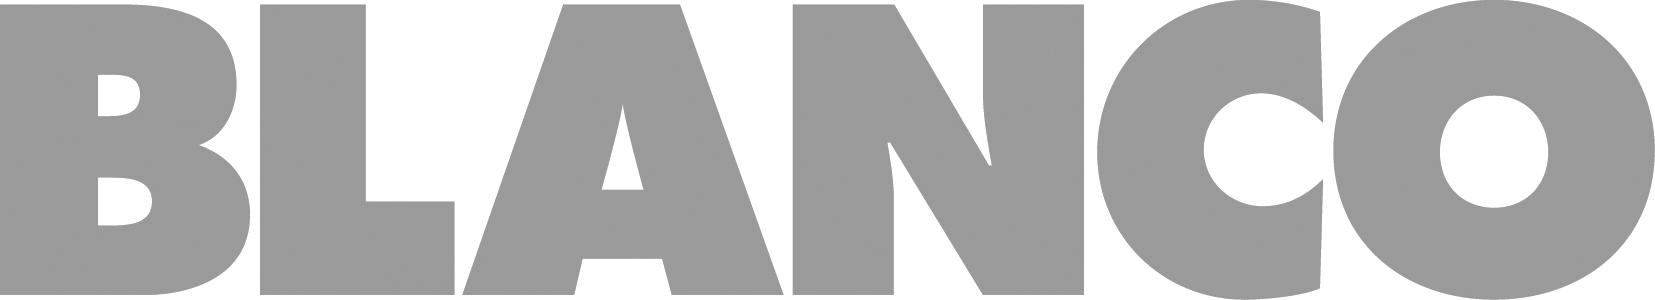 blanco_logo_K.jpg